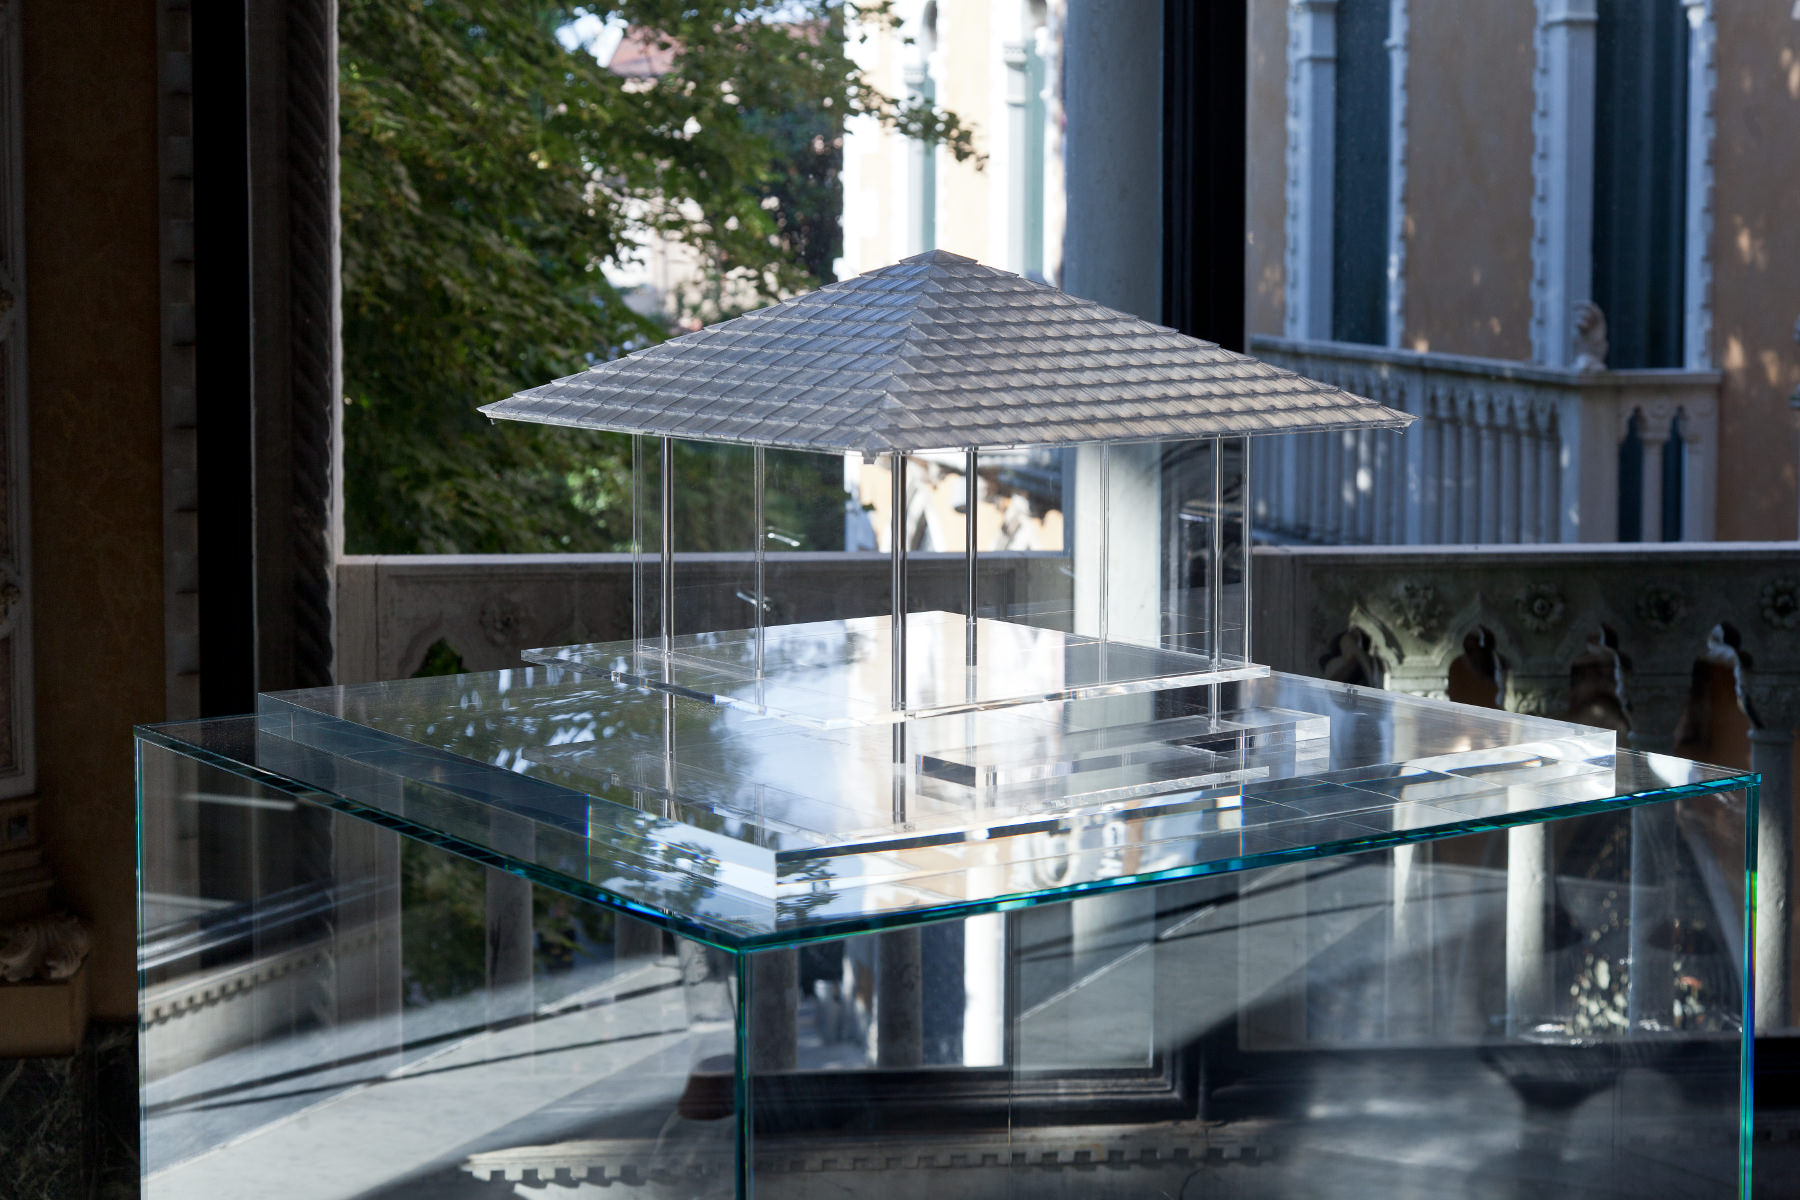 Tokujin Yoshioka's The Glass Tea House